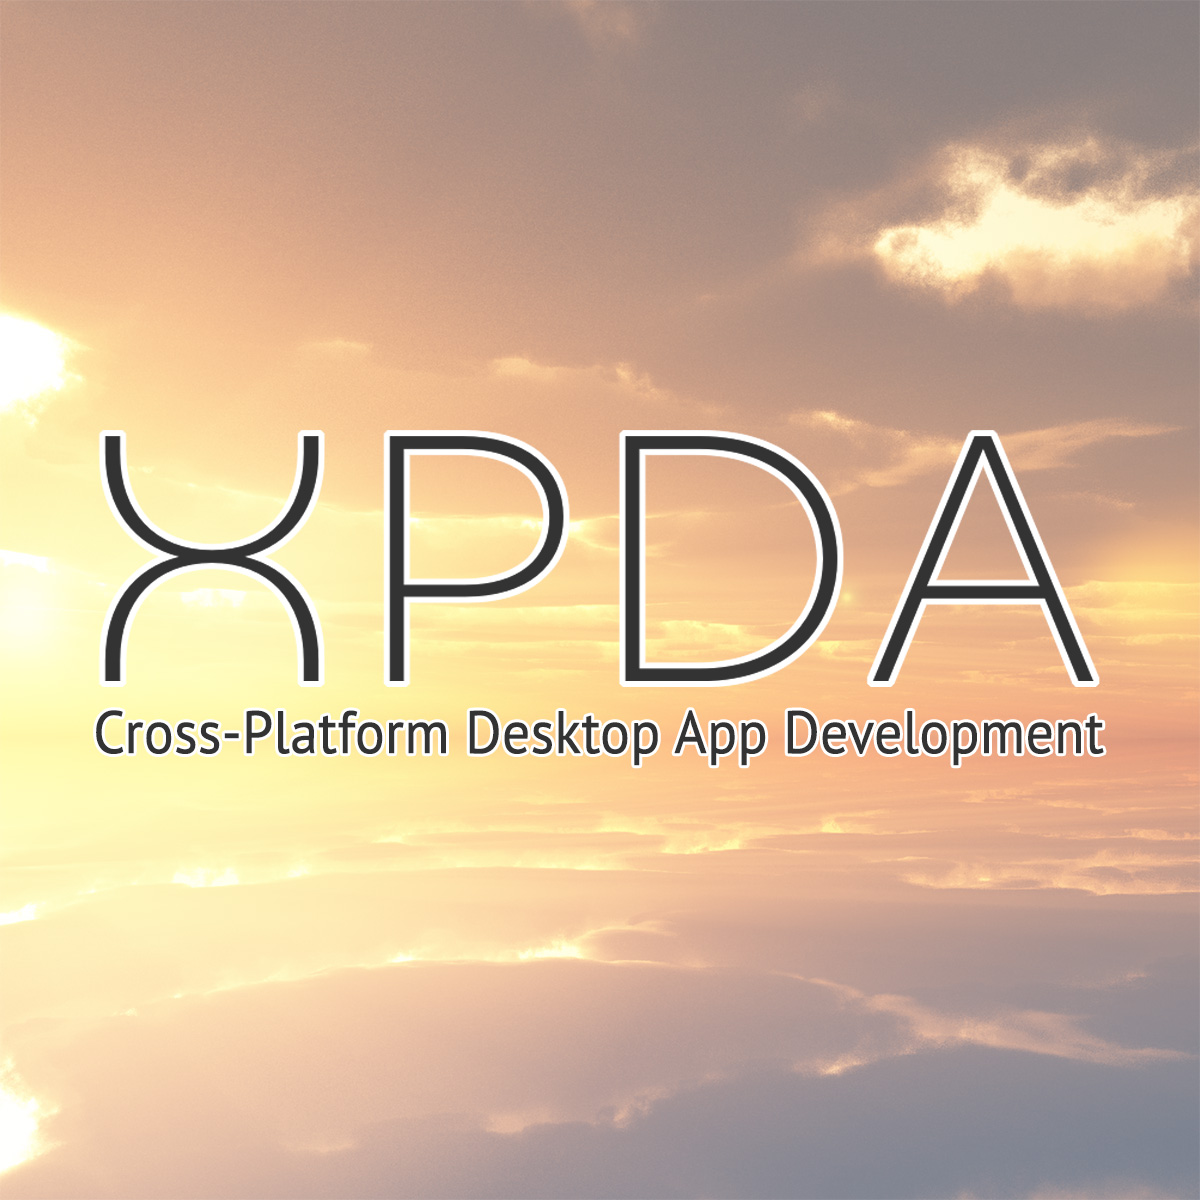 Cross-Platform Desktop App Development (XPDA)